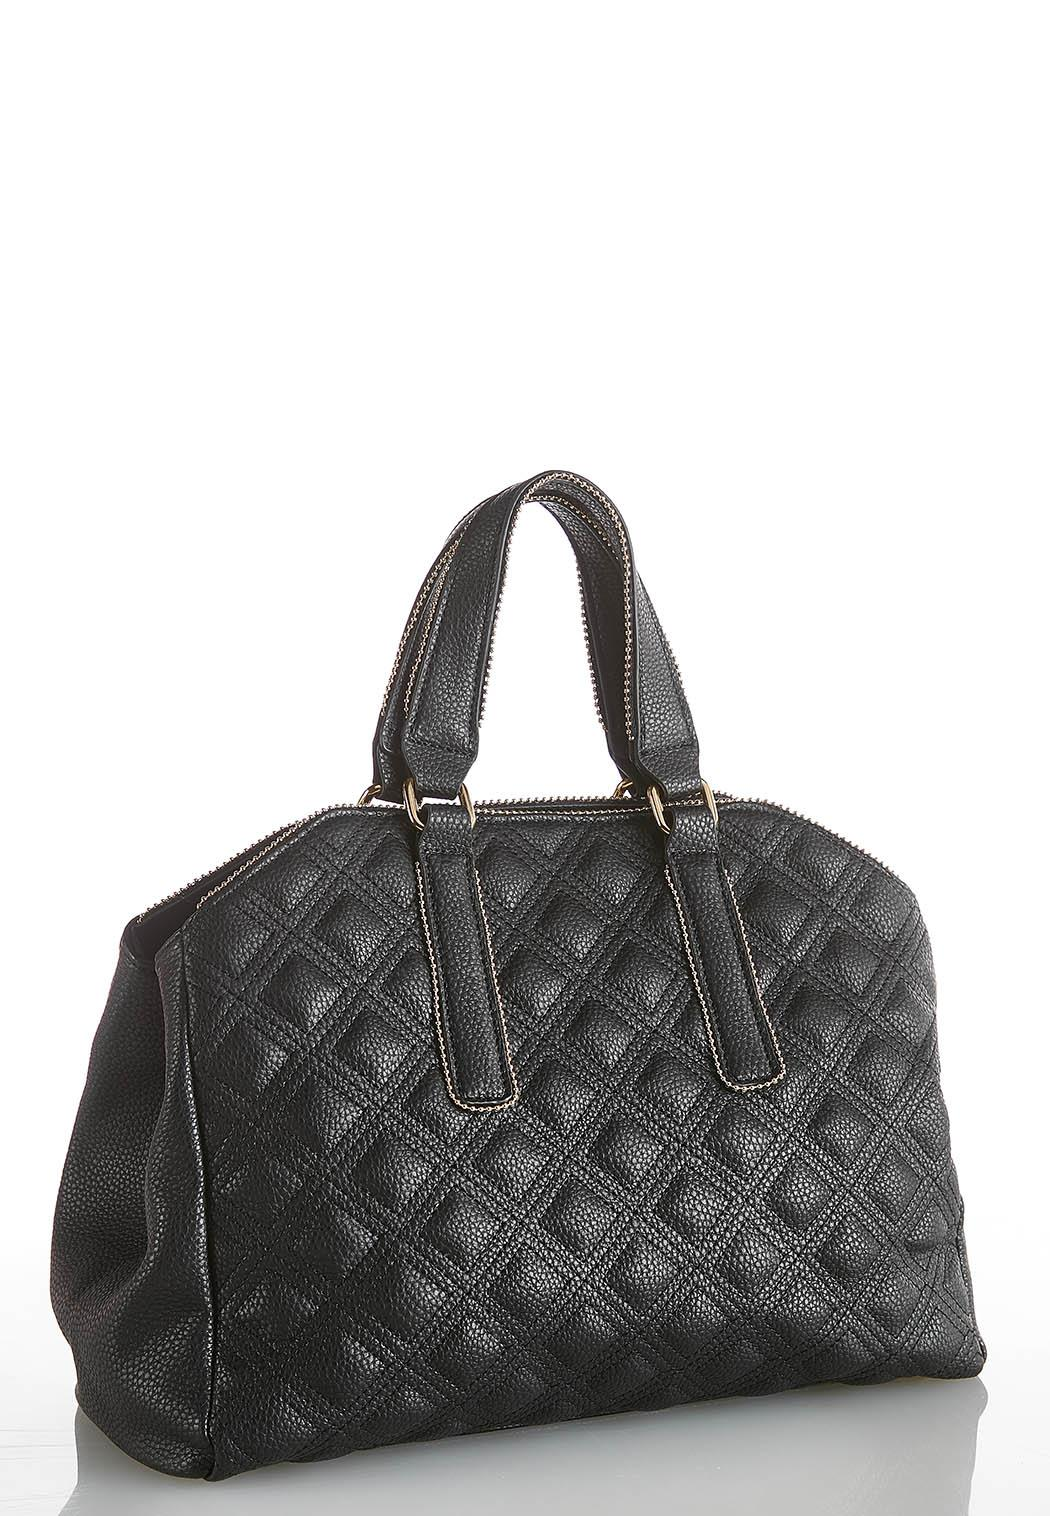 Women s Handbags 7247a7aab1103